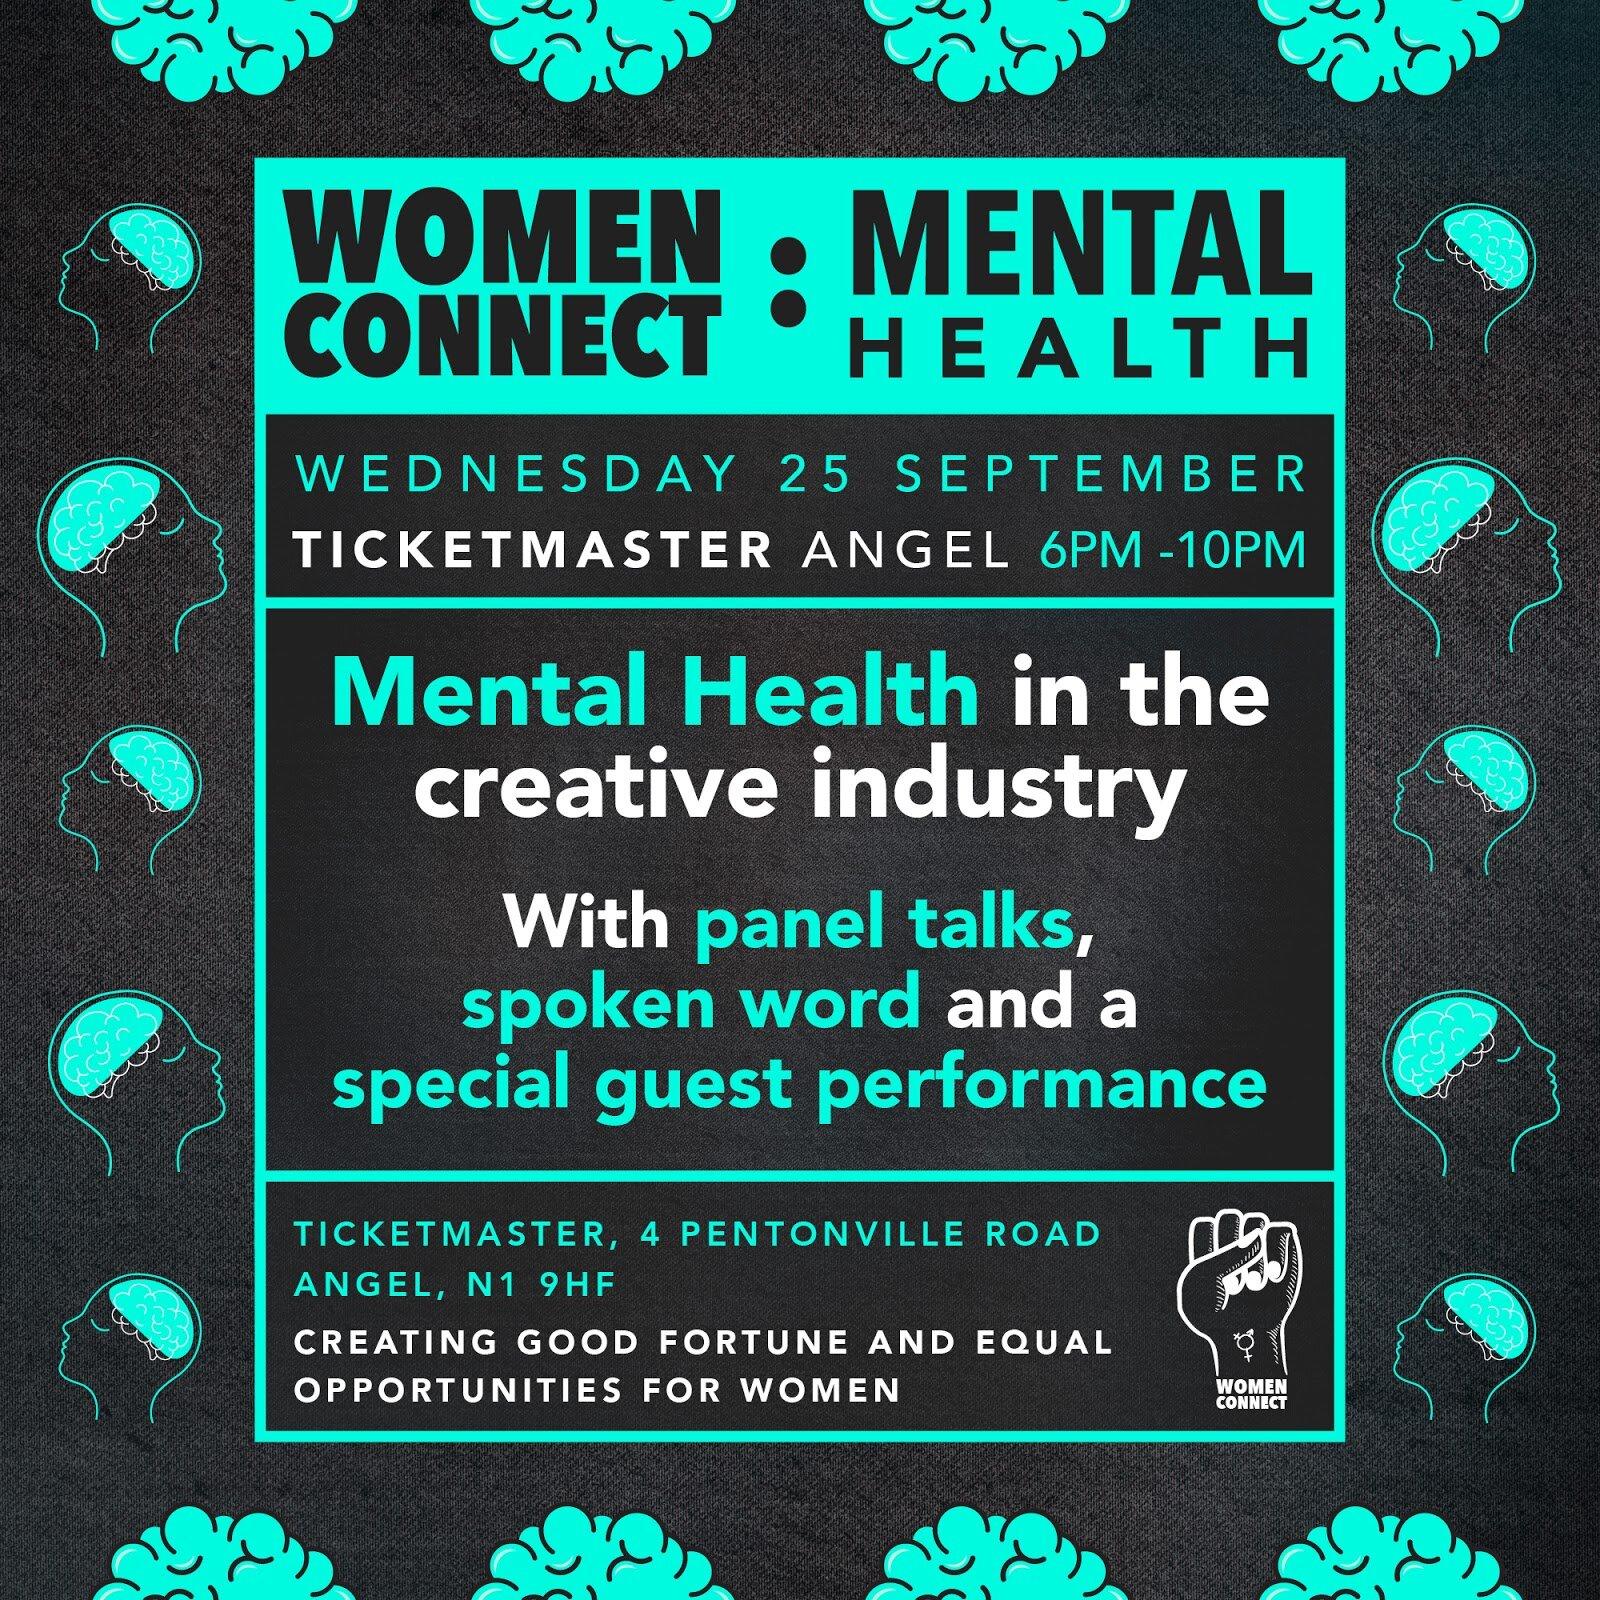 WOMEN CONNECT_INSTA_MentalHealth1.jpg